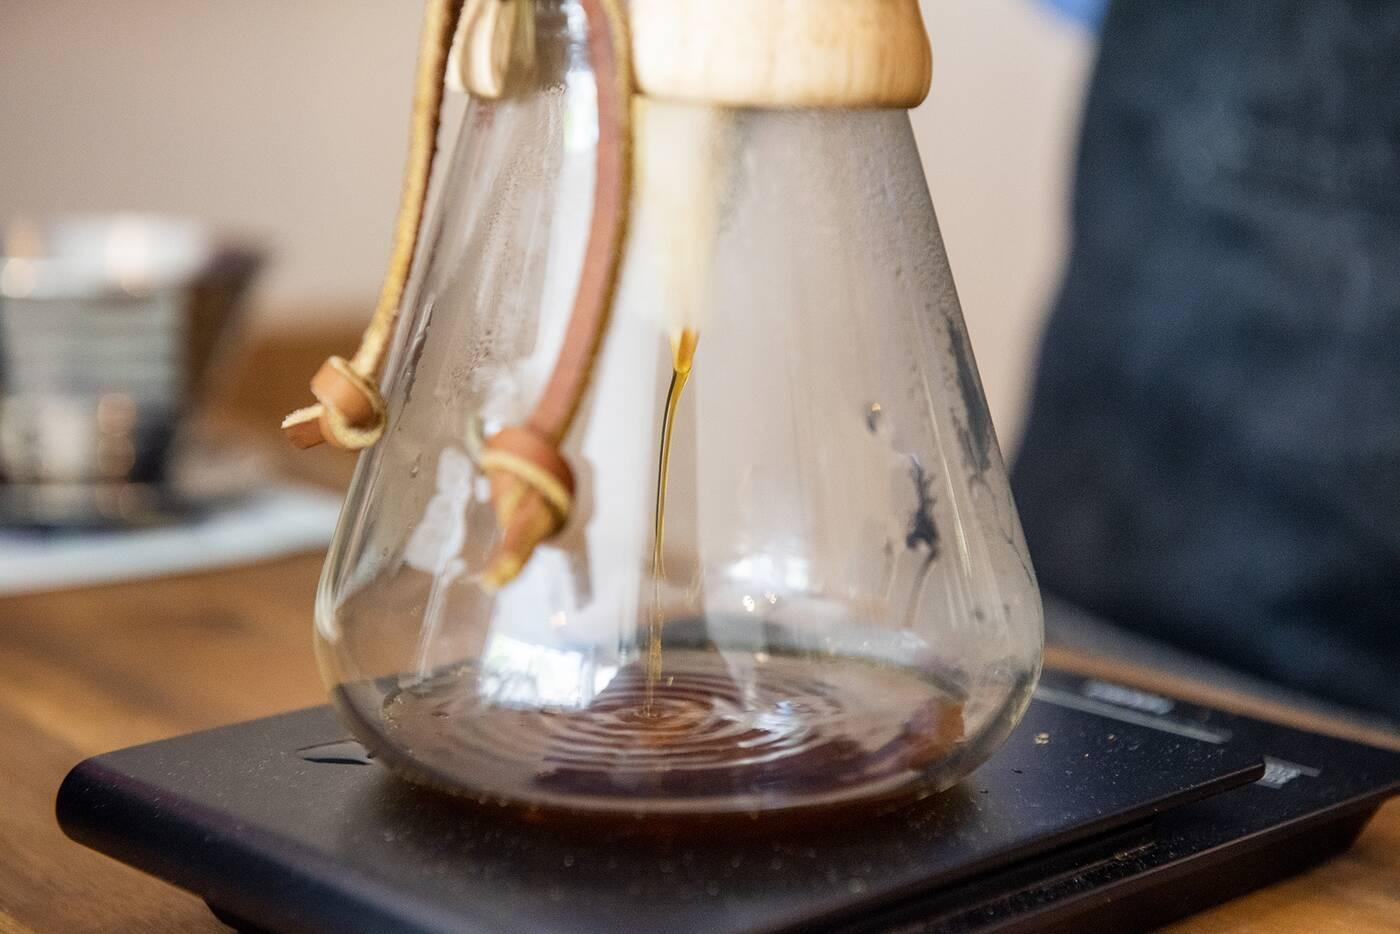 At Origin Coffee Toronto